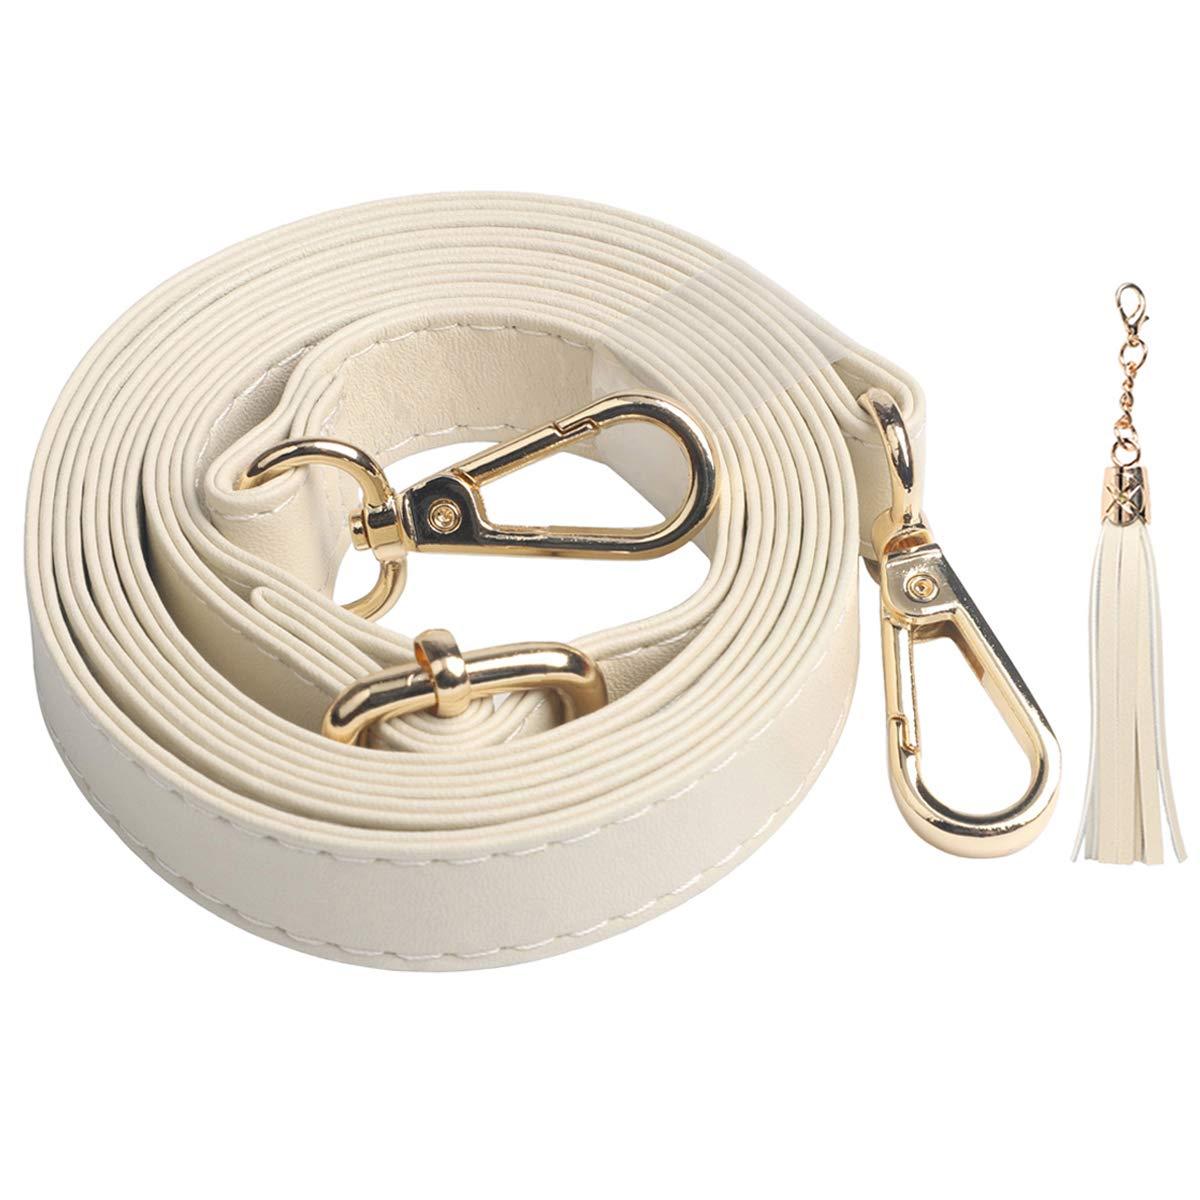 BEAULEGAN Crossbody Bag Strap Full Grain Adjustable 150cm Long 2cm Wide Replacement for Handbag//Purse Microfiber Leather Dark Brown//Gold